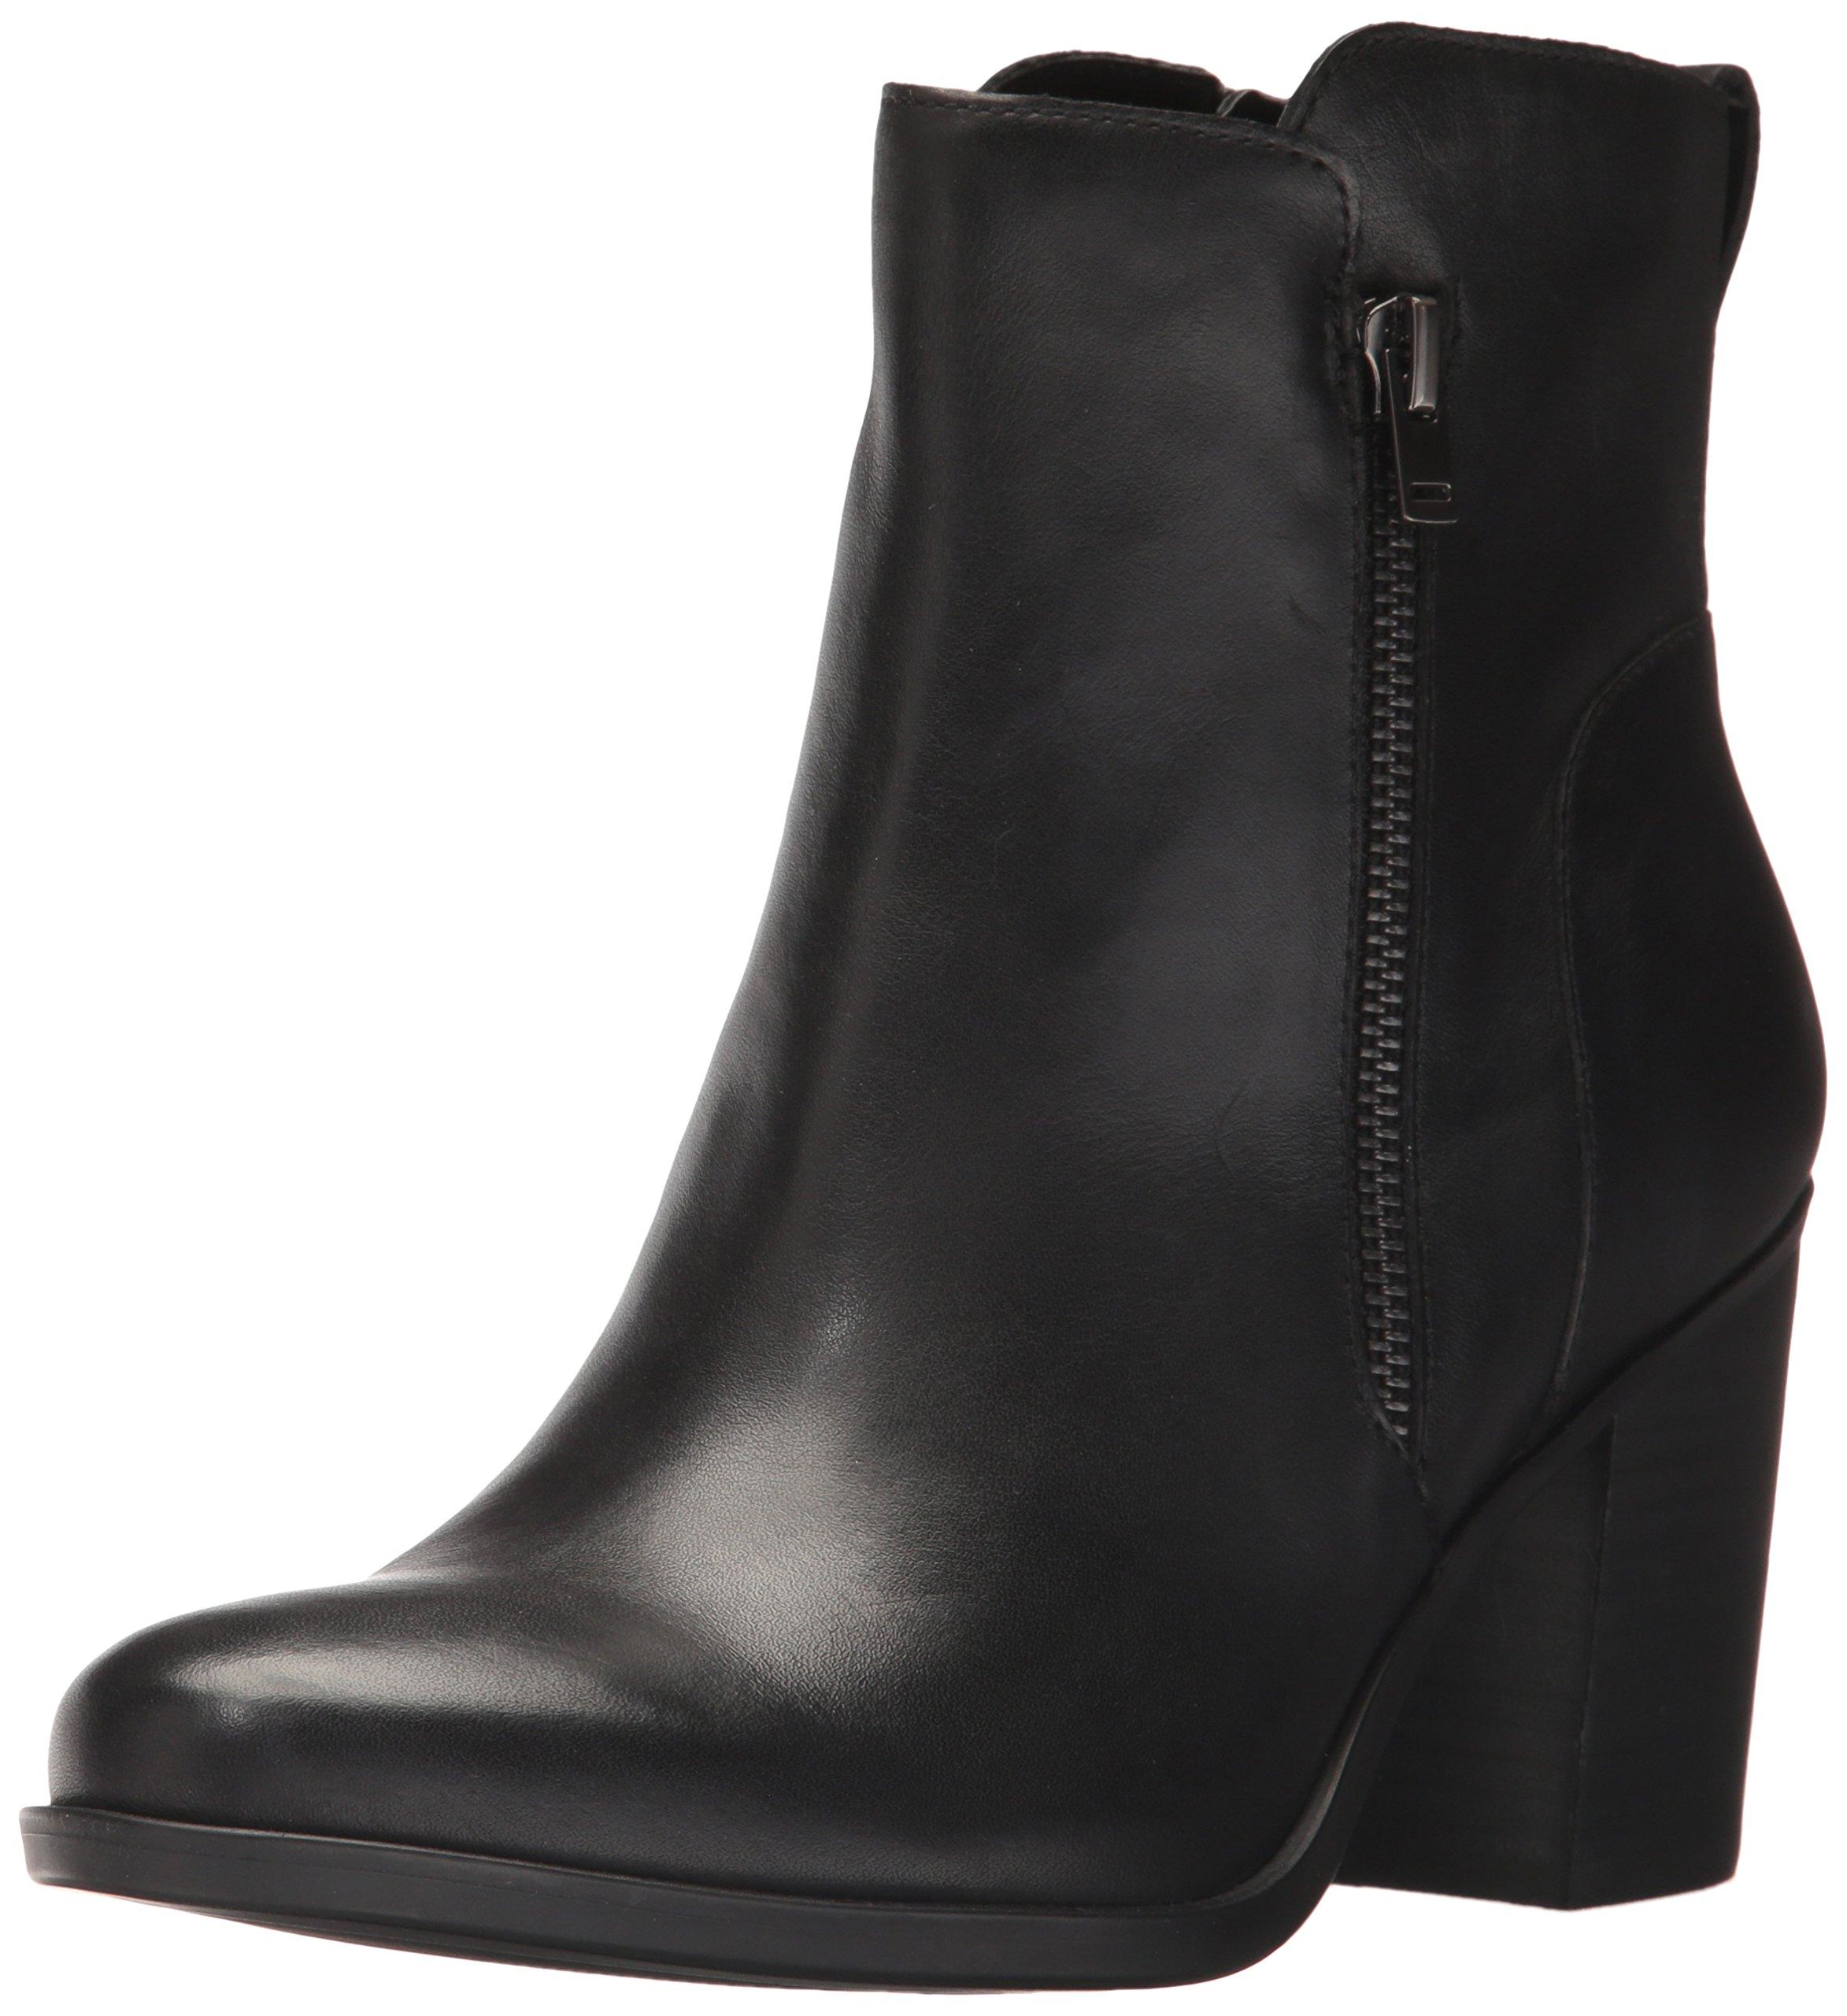 Naturalizer Women's Kala Boot, Black, 9.5 M US